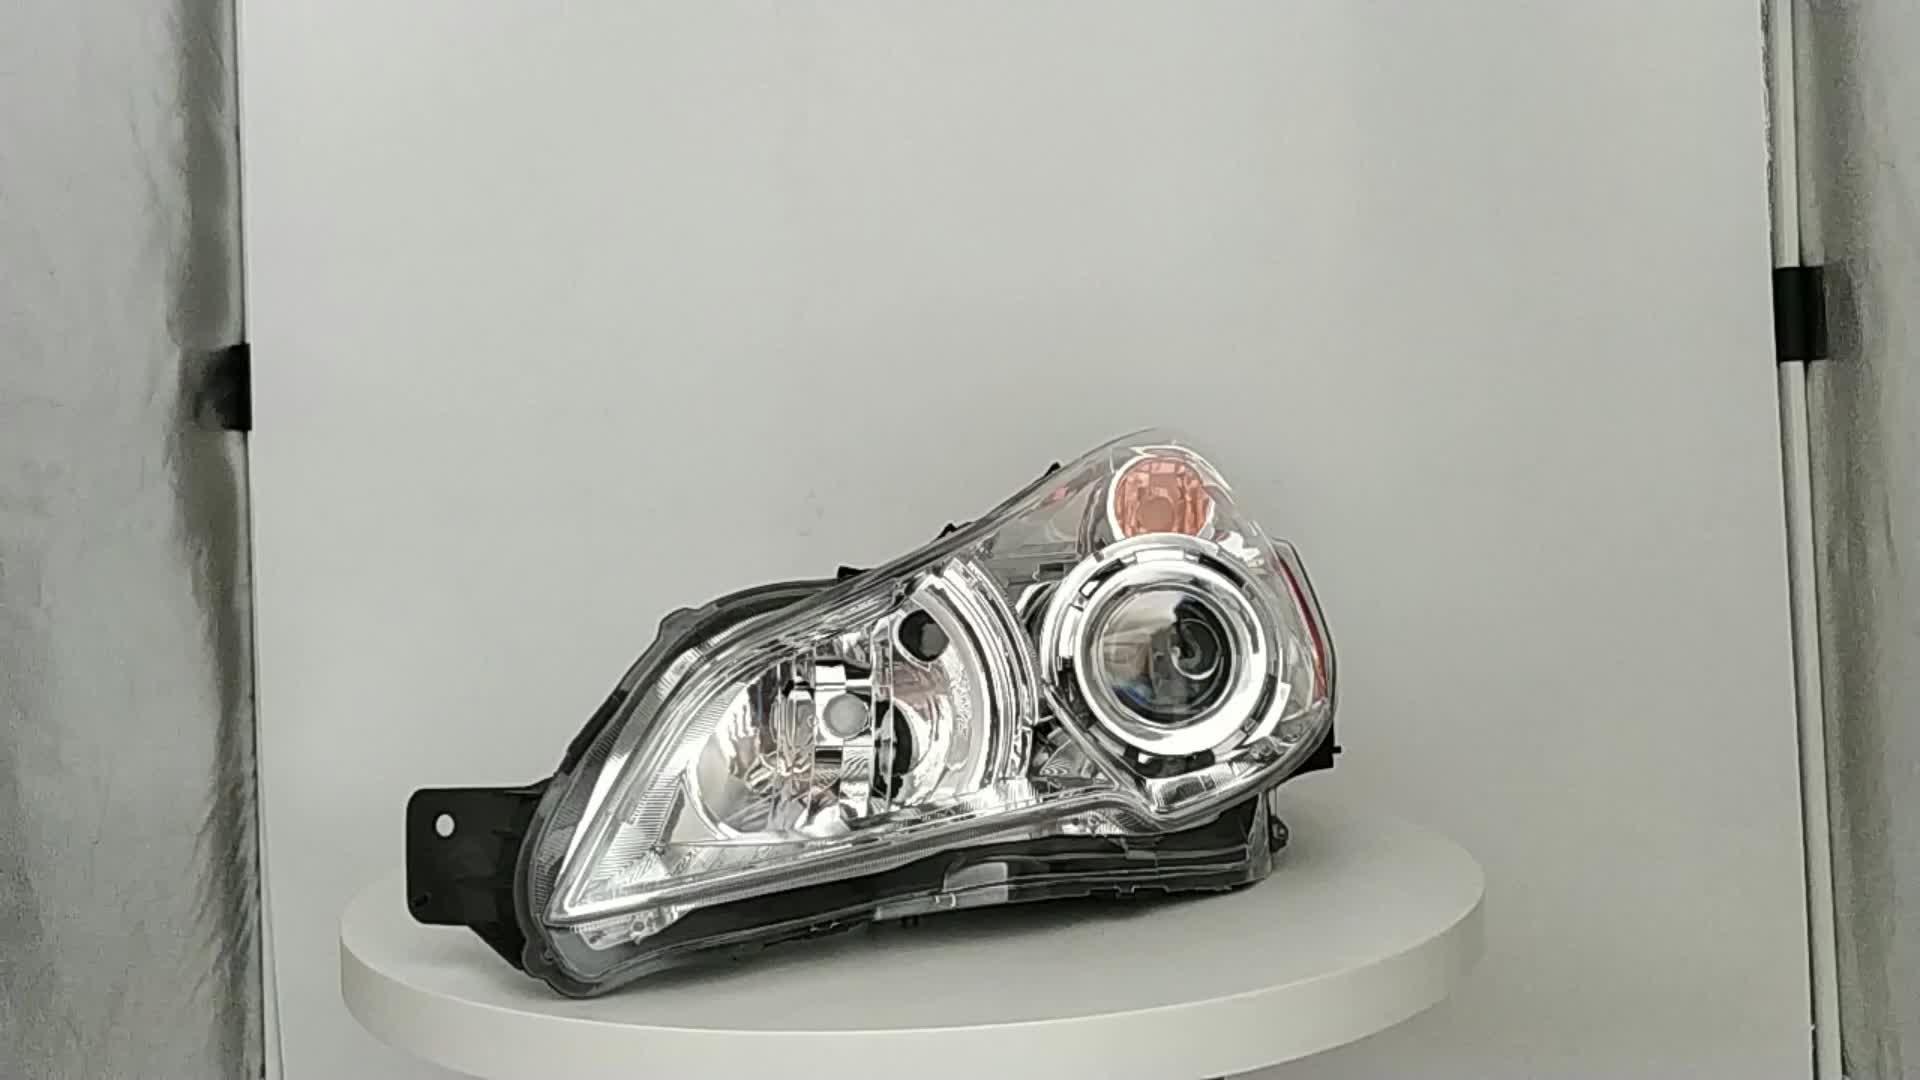 Auto Lighting System for Subaru Legacy 2010 2011 2012  Headlight Headlamp Replacement